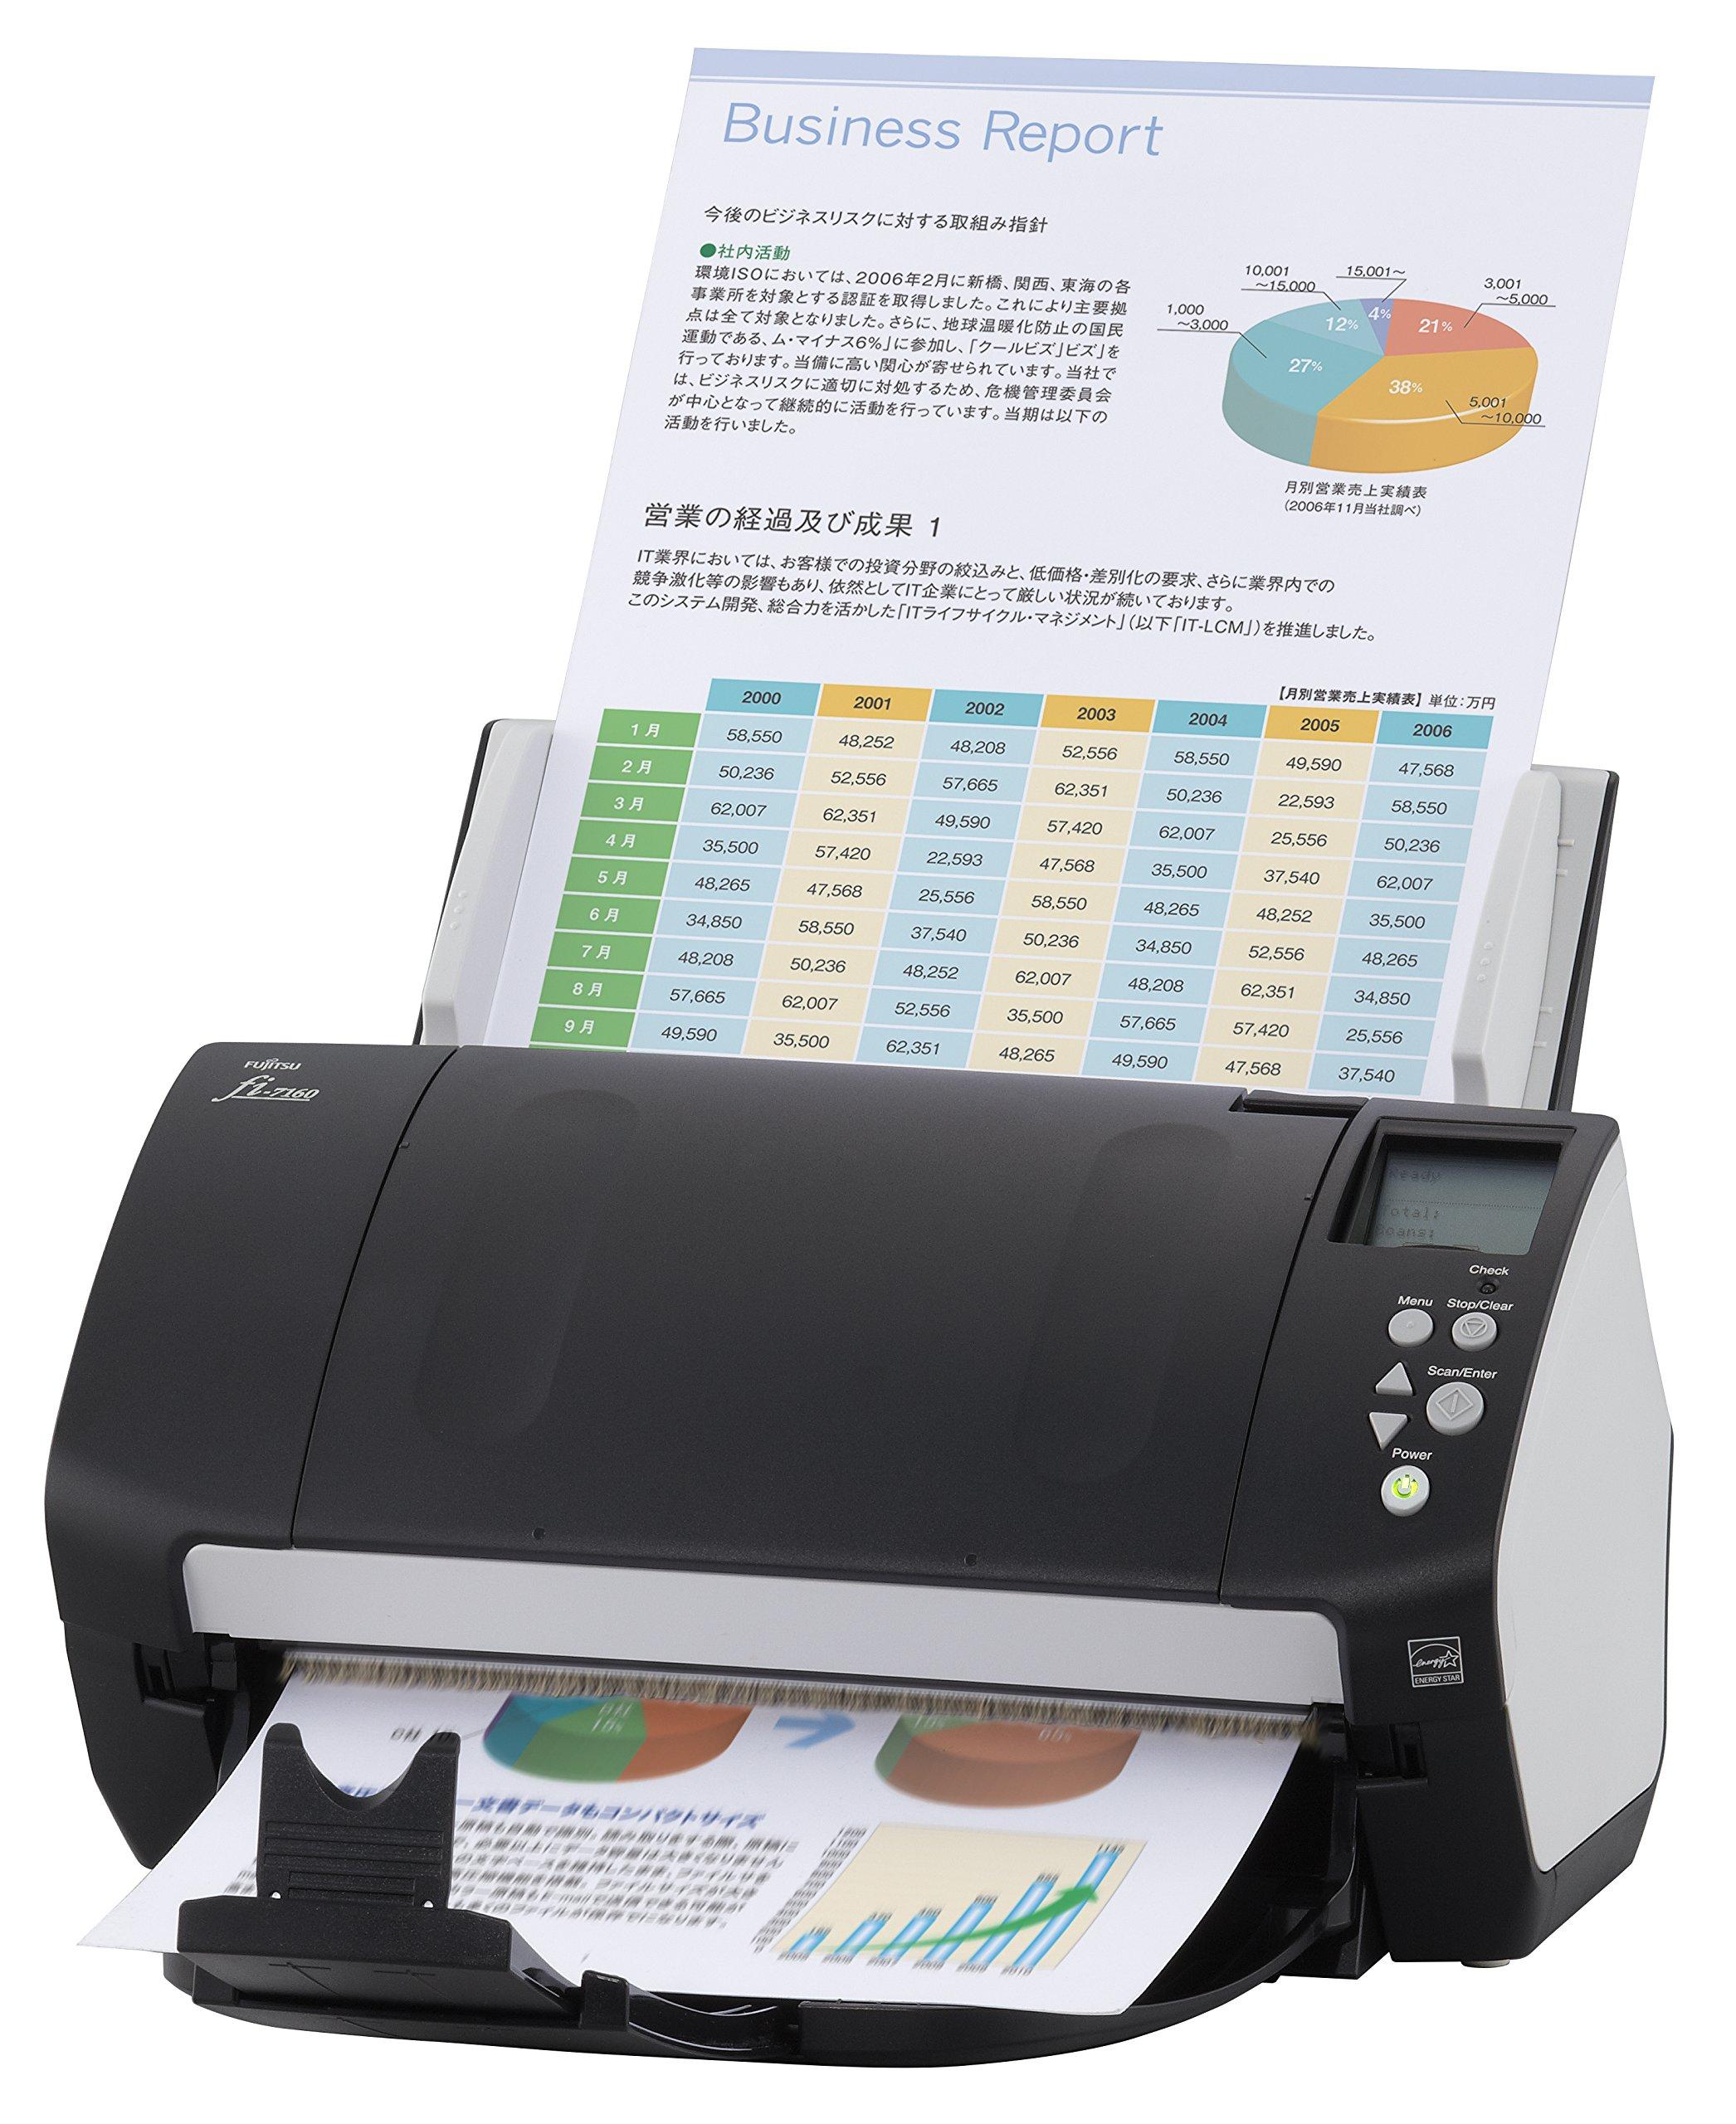 Fujitsu fi-7160 Color Duplex Document Scanner - Workgroup Series by Fujitsu (Image #3)